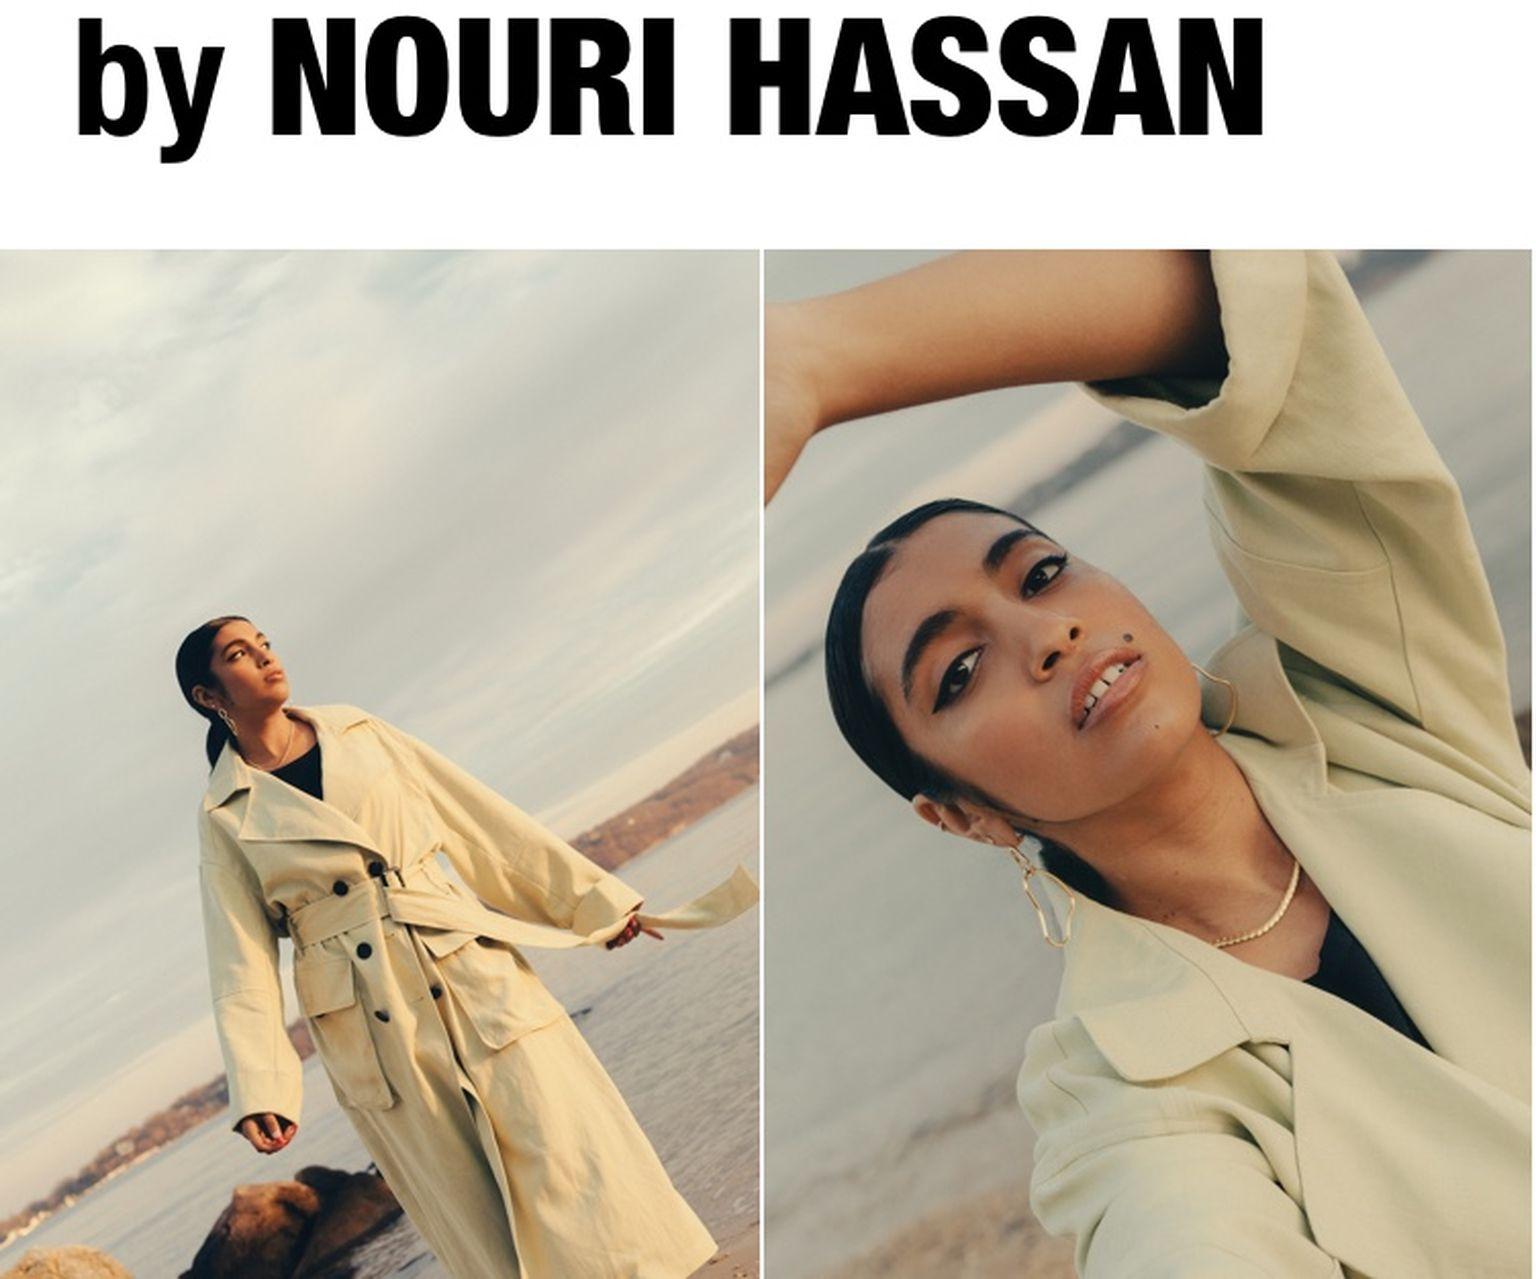 Nouri-Hassan